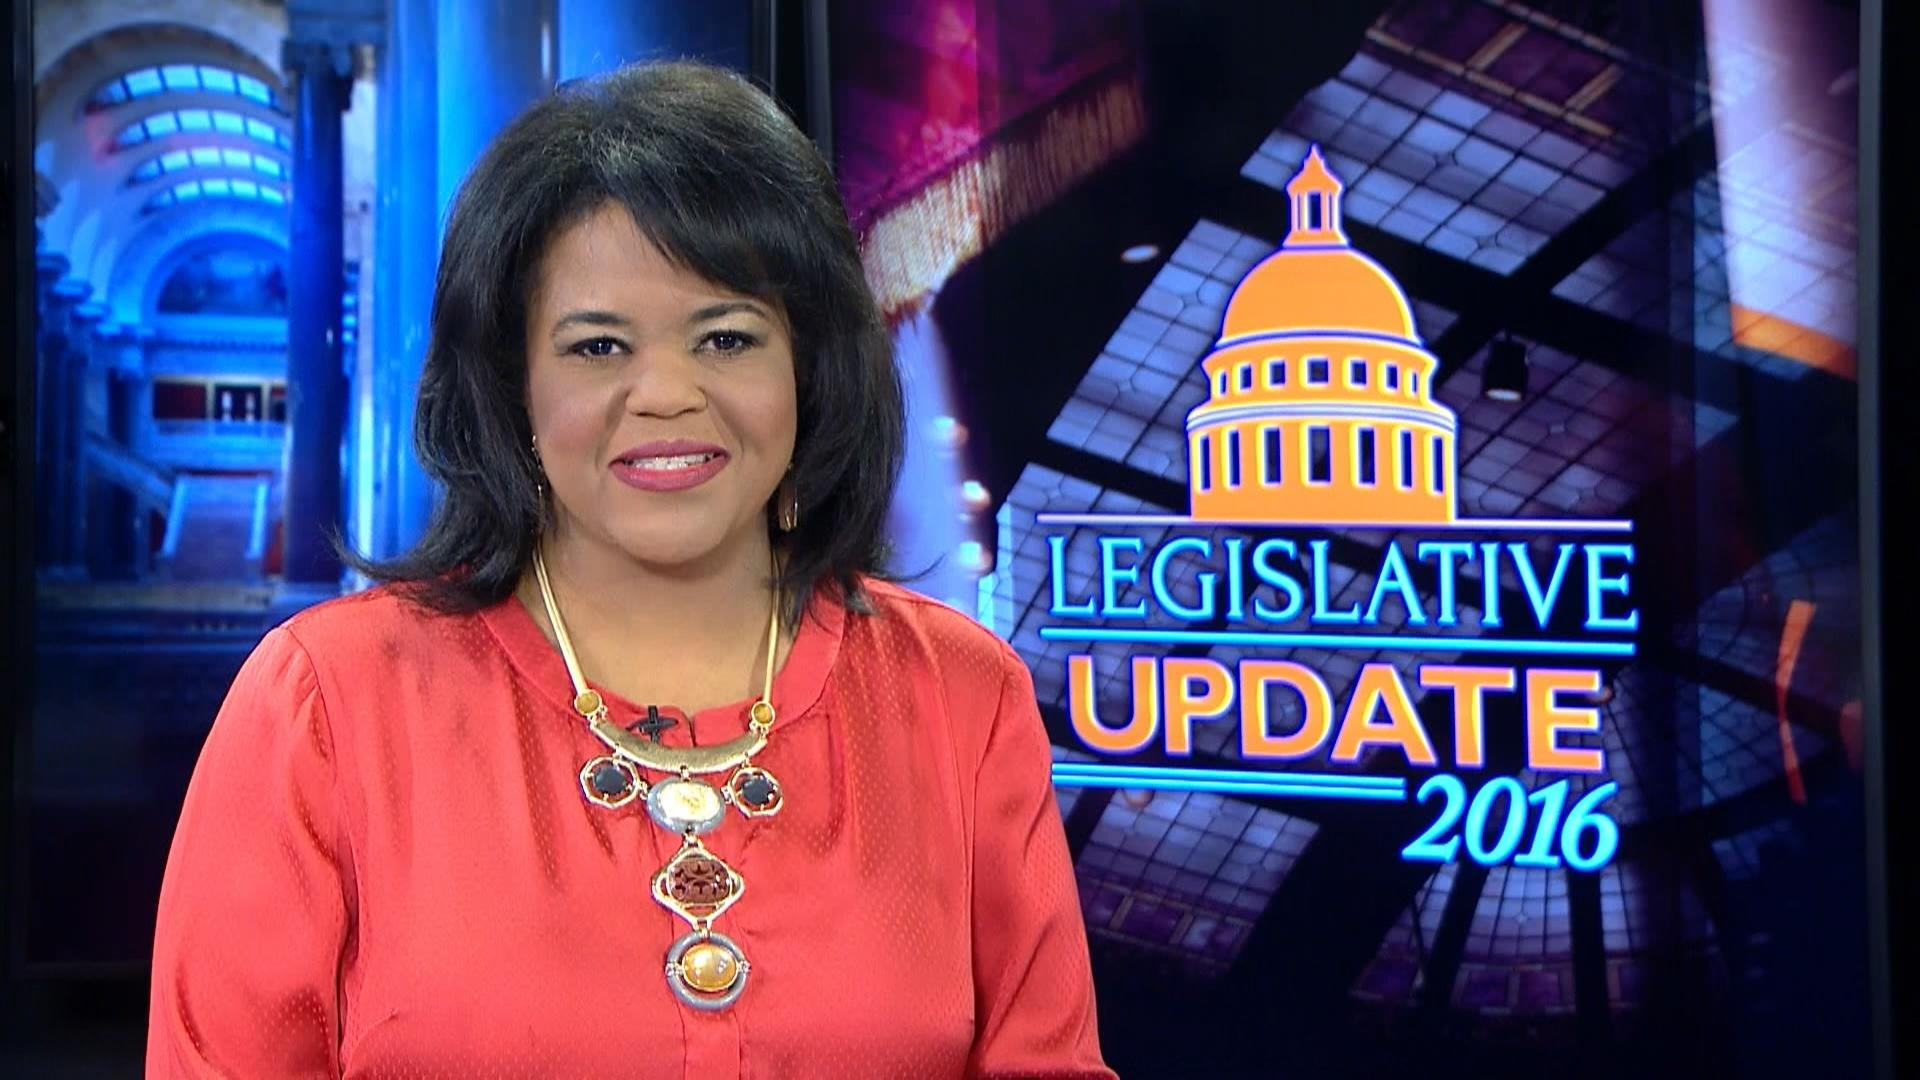 watch full episodes online of legislative update on pbs